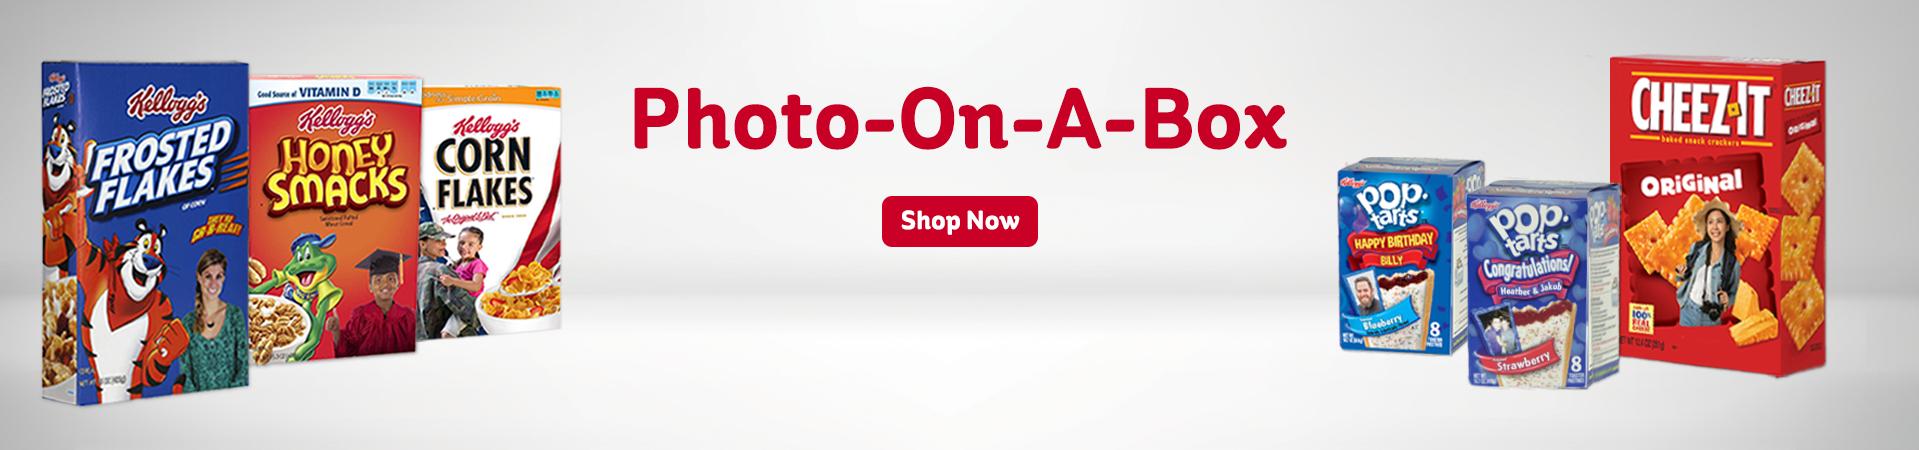 Shop Photo-on-a-Box